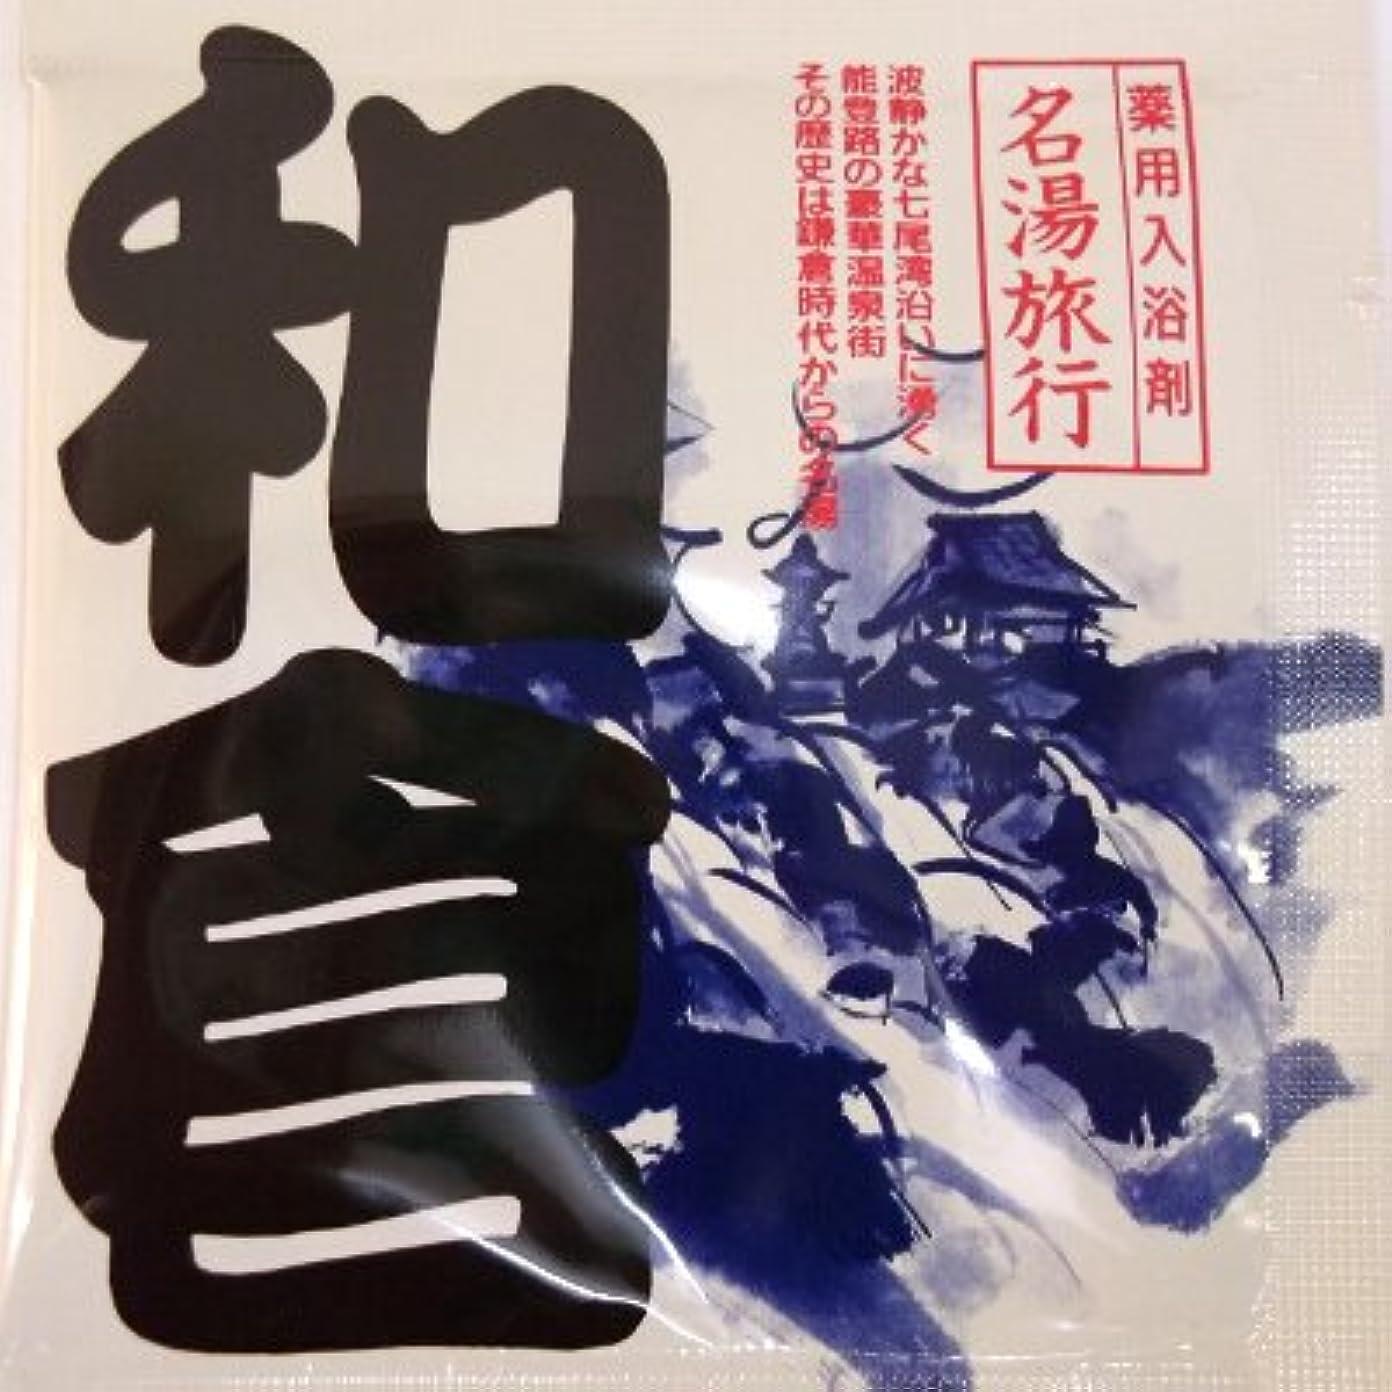 盆変化する検閲名湯旅行 和倉